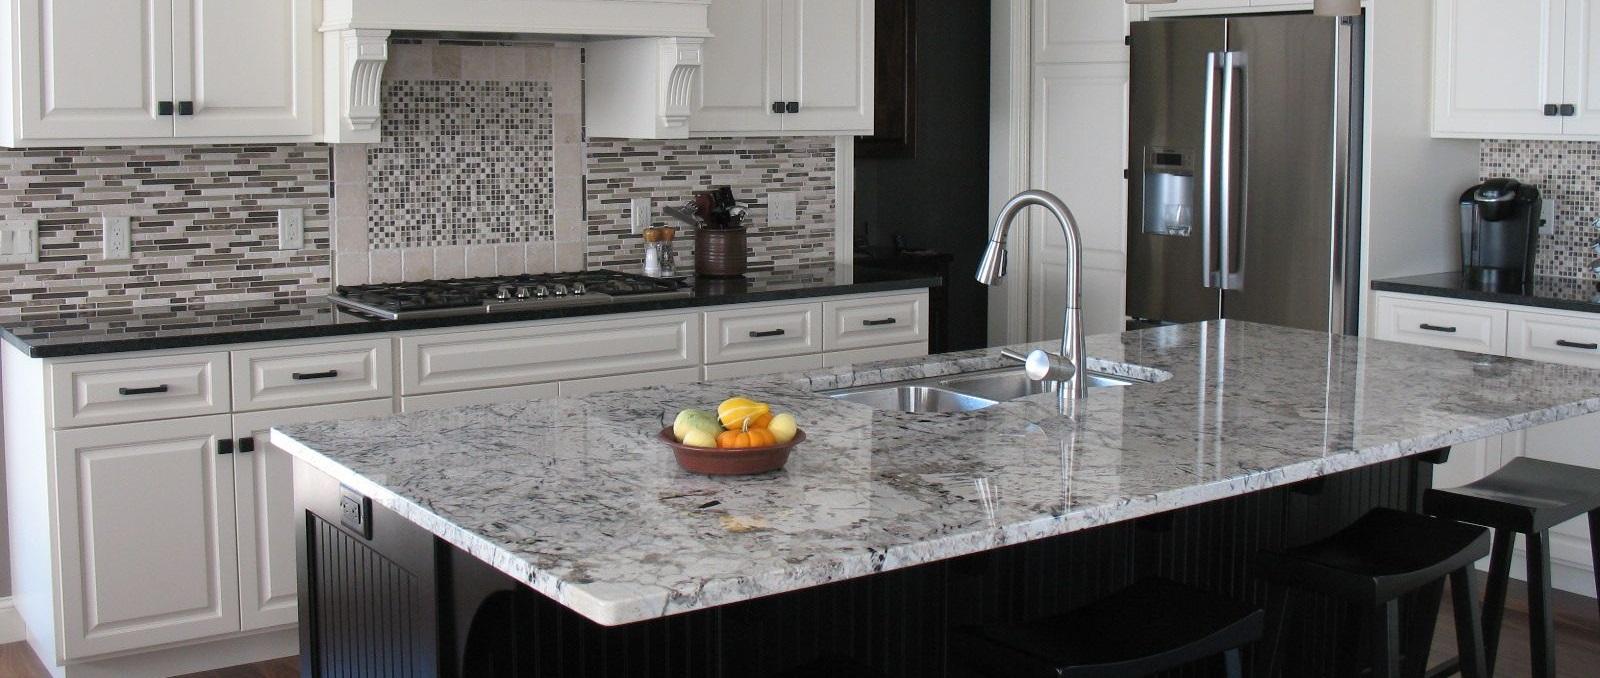 Home | Mid America Granite U0026 Natural Stones In Wichita And ...